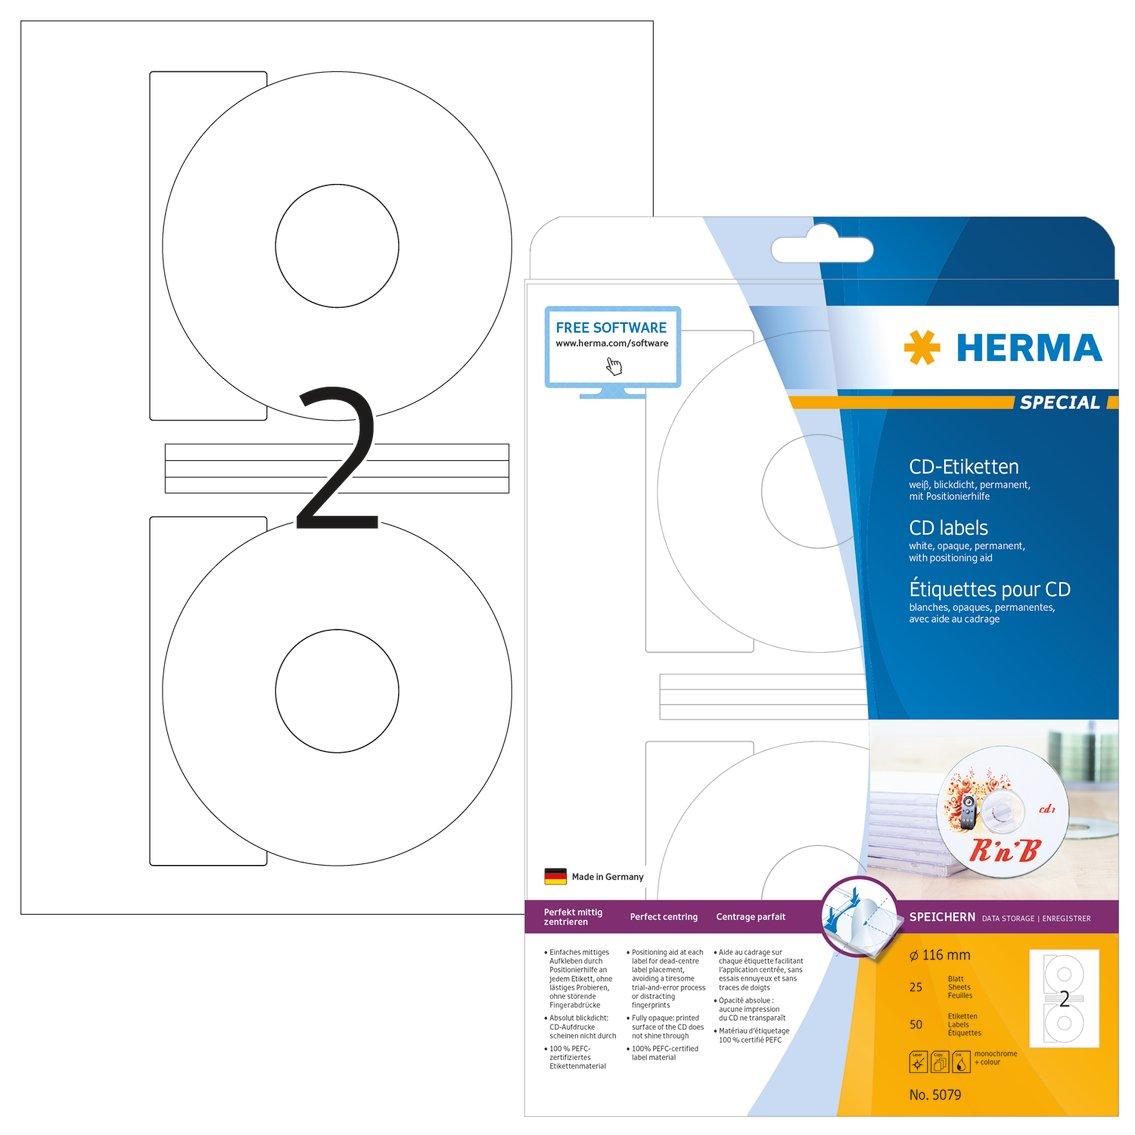 Herma 5079 CD DVD Etiketten blickdicht (Ø 116 mm, Innenloch groß) weiß, 50 Stück, 25 Blatt A4 Papier, Zentrierhilfe, bedruckbar, selbstklebend